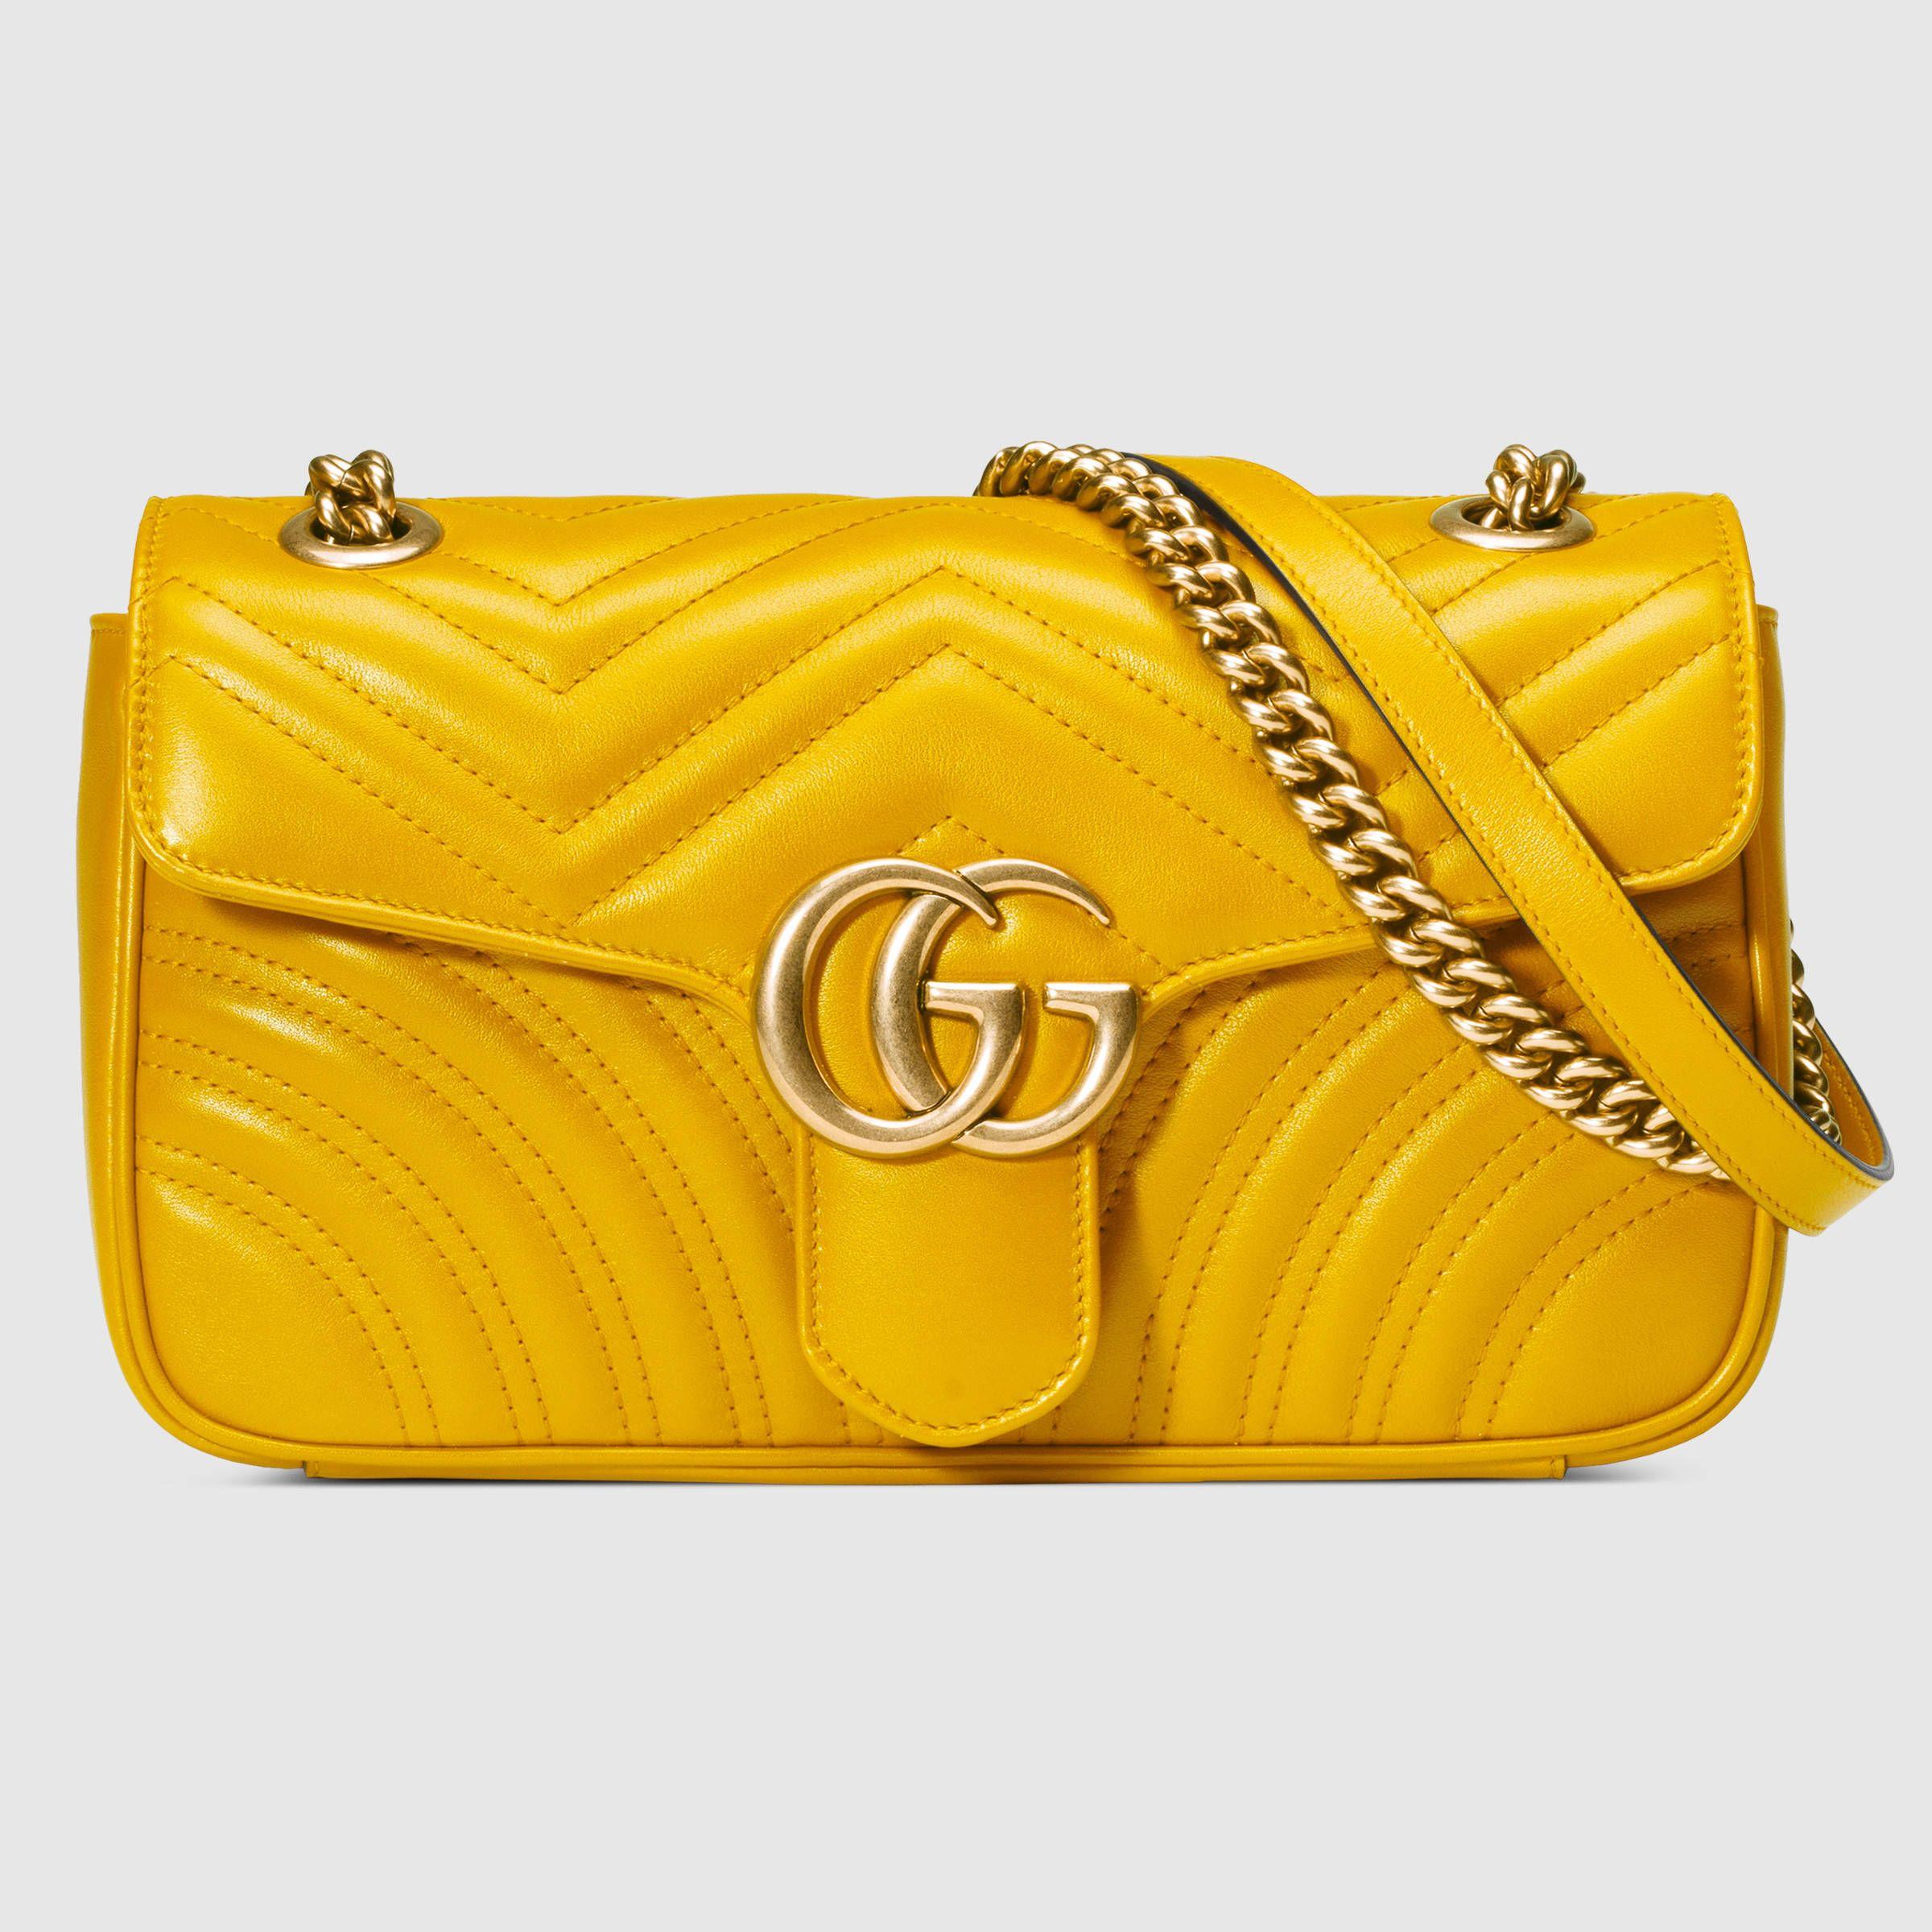 Gg Marmont Matelassé Shoulder Bag Gucci Women S Bags 443497drw3t7223 Yellow